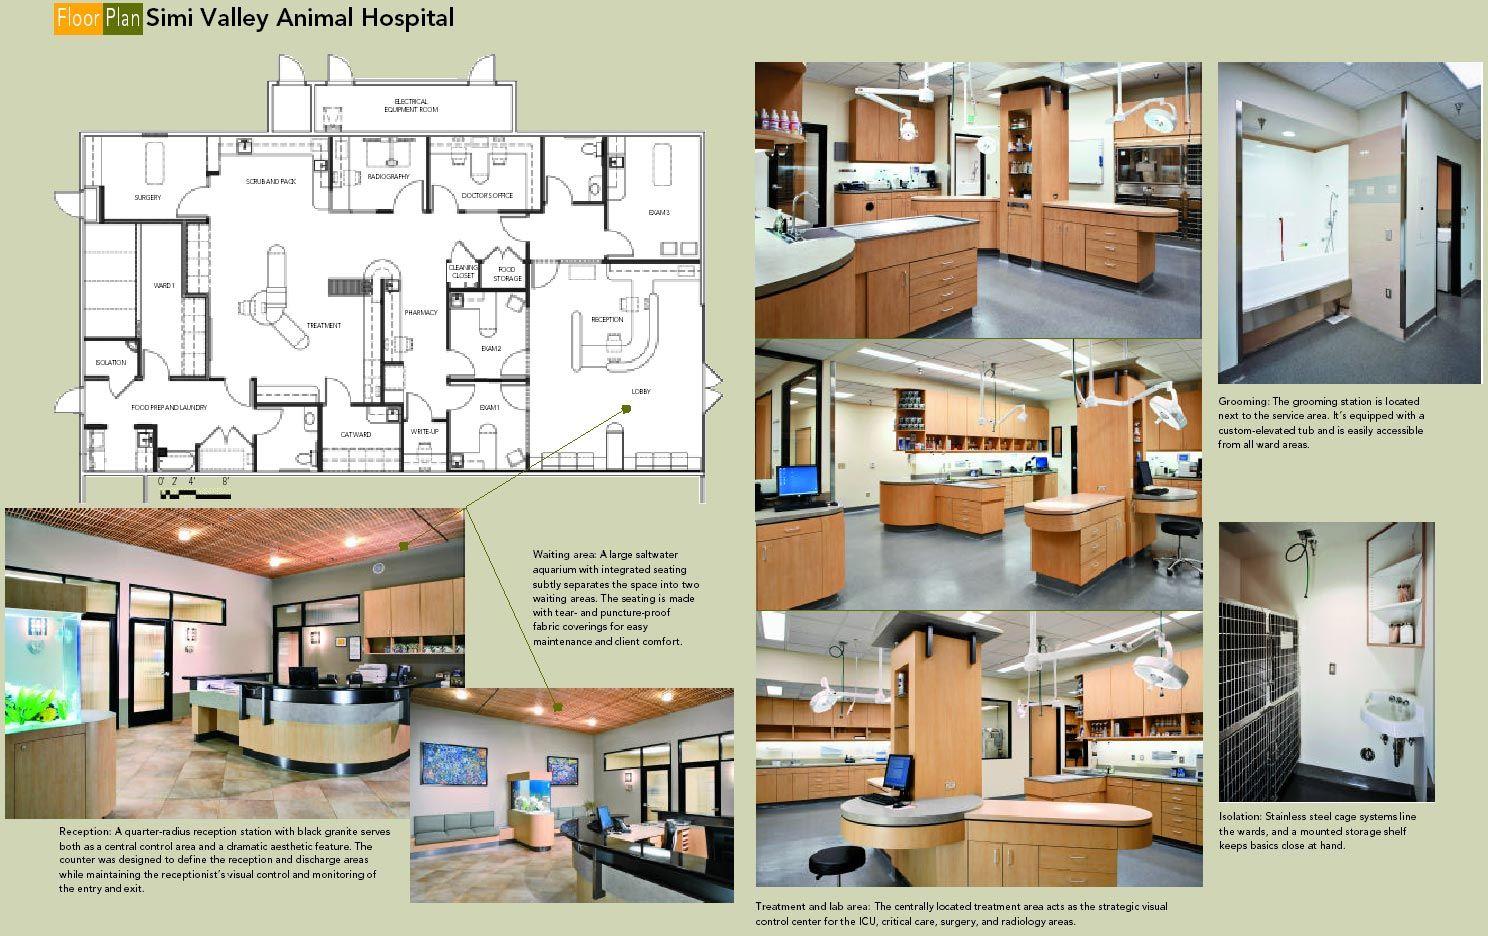 13+ East petaluma animal hospital ideas in 2021